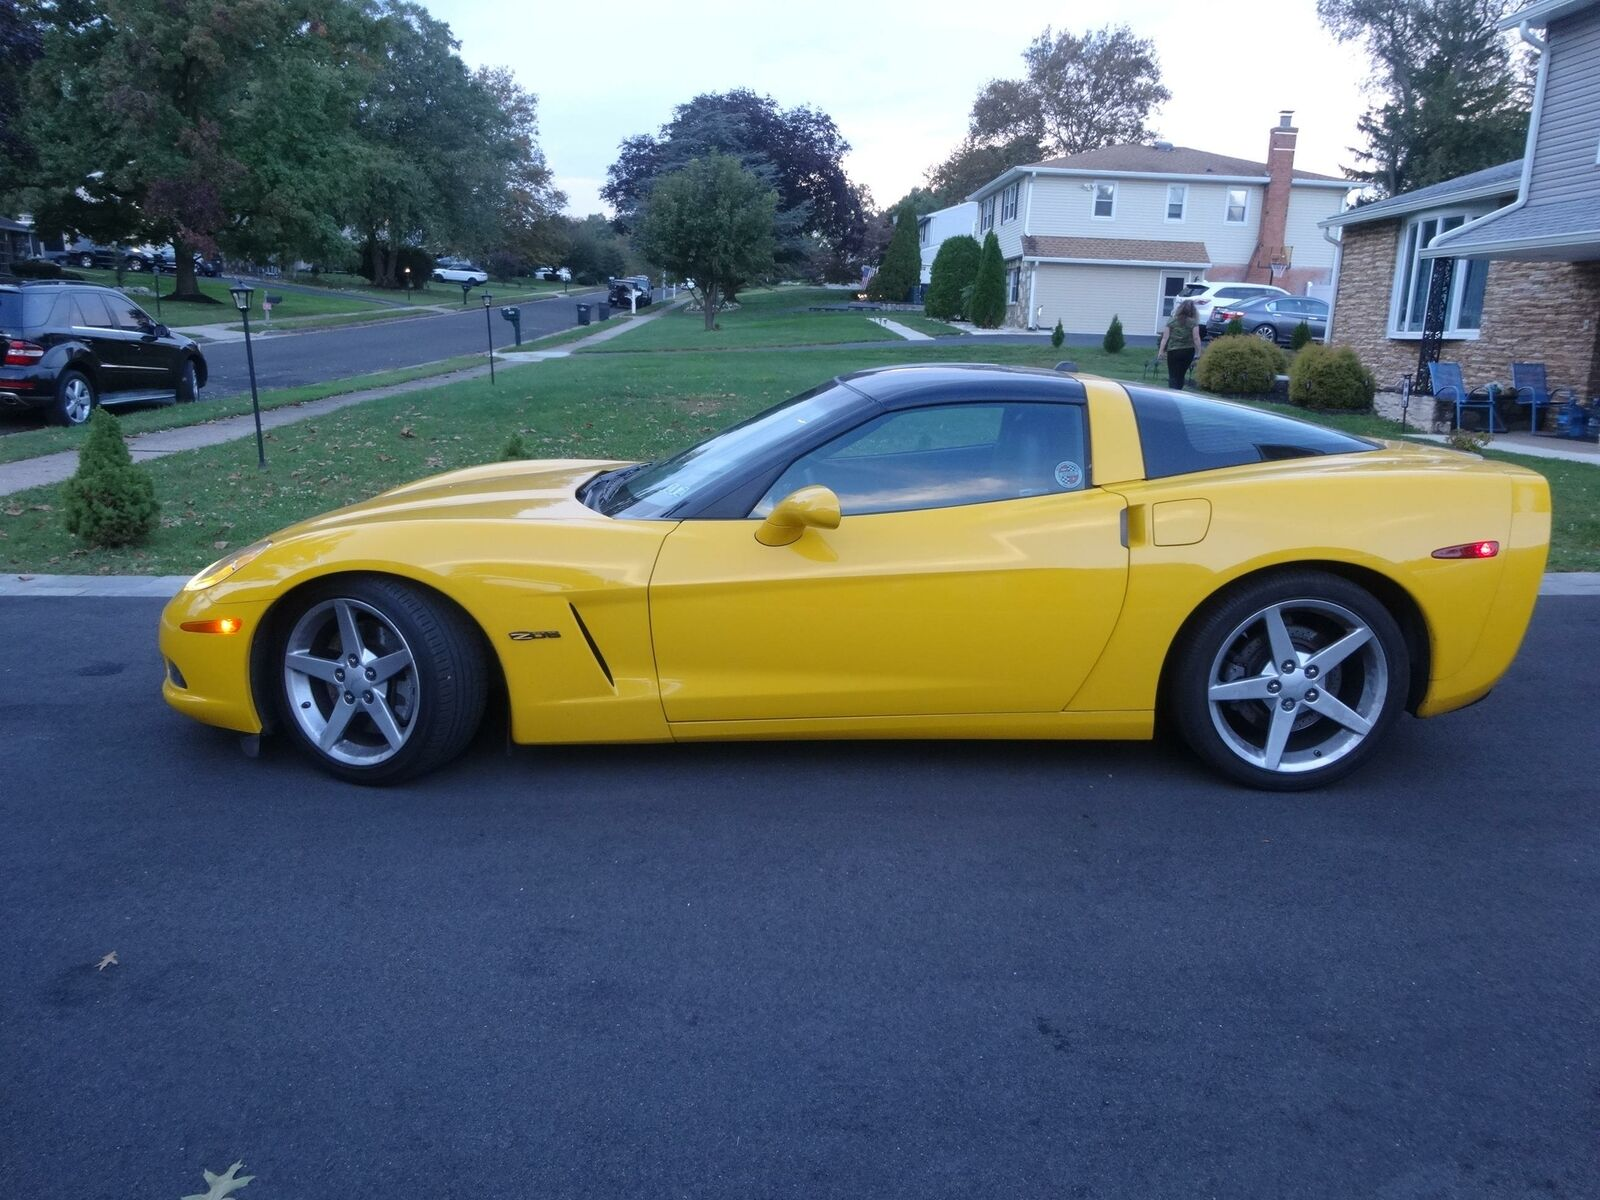 2005 Yellow Chevrolet Corvette     C6 Corvette Photo 1